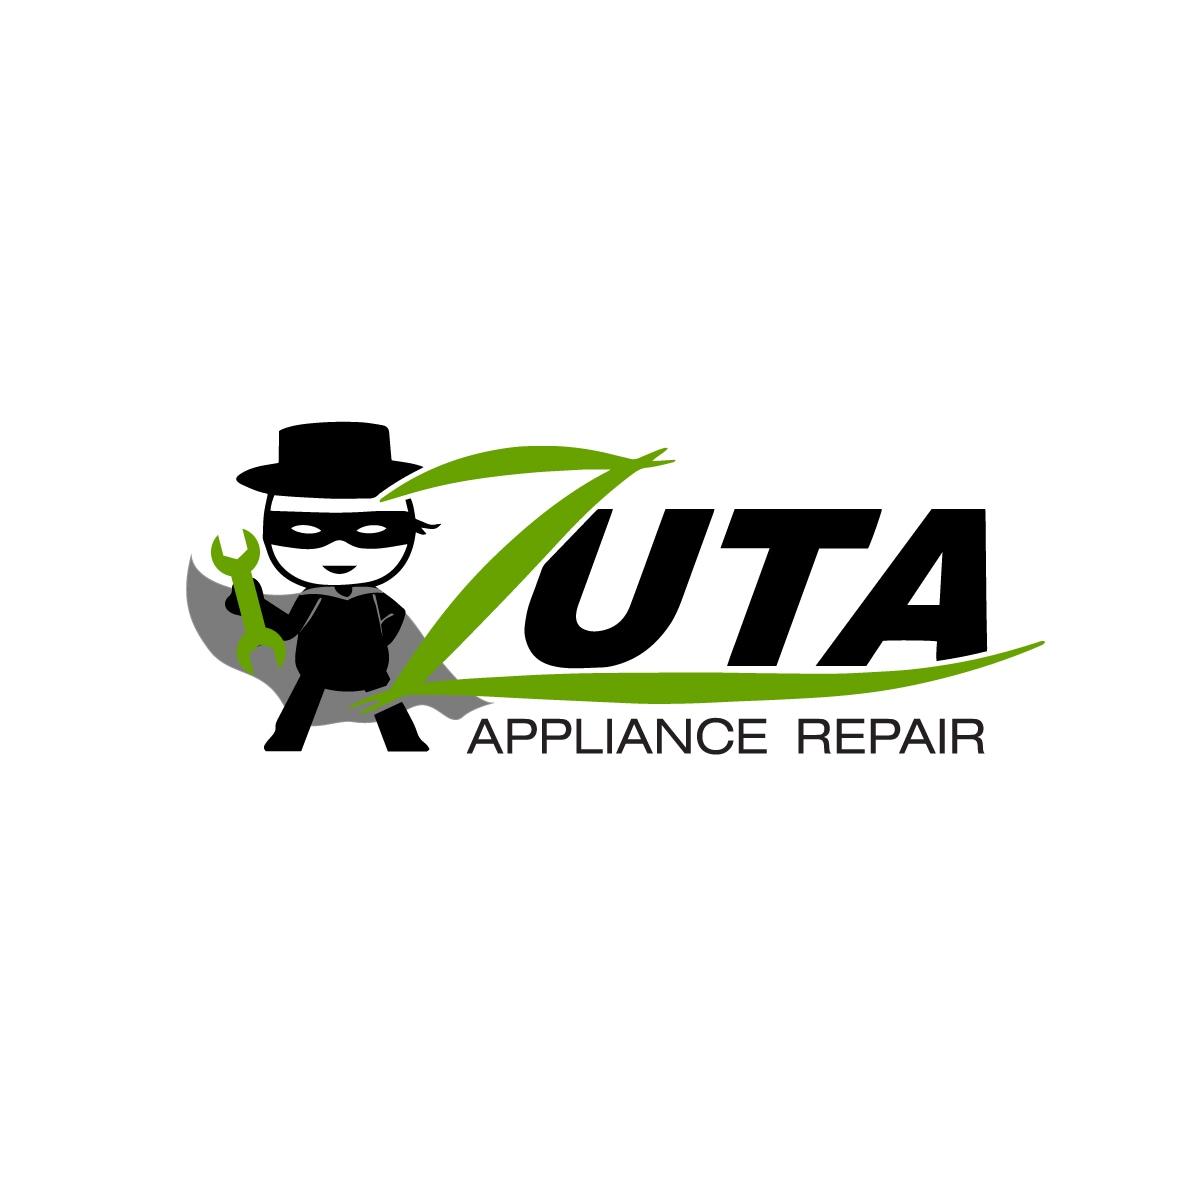 Zuta Appliance Repair logo